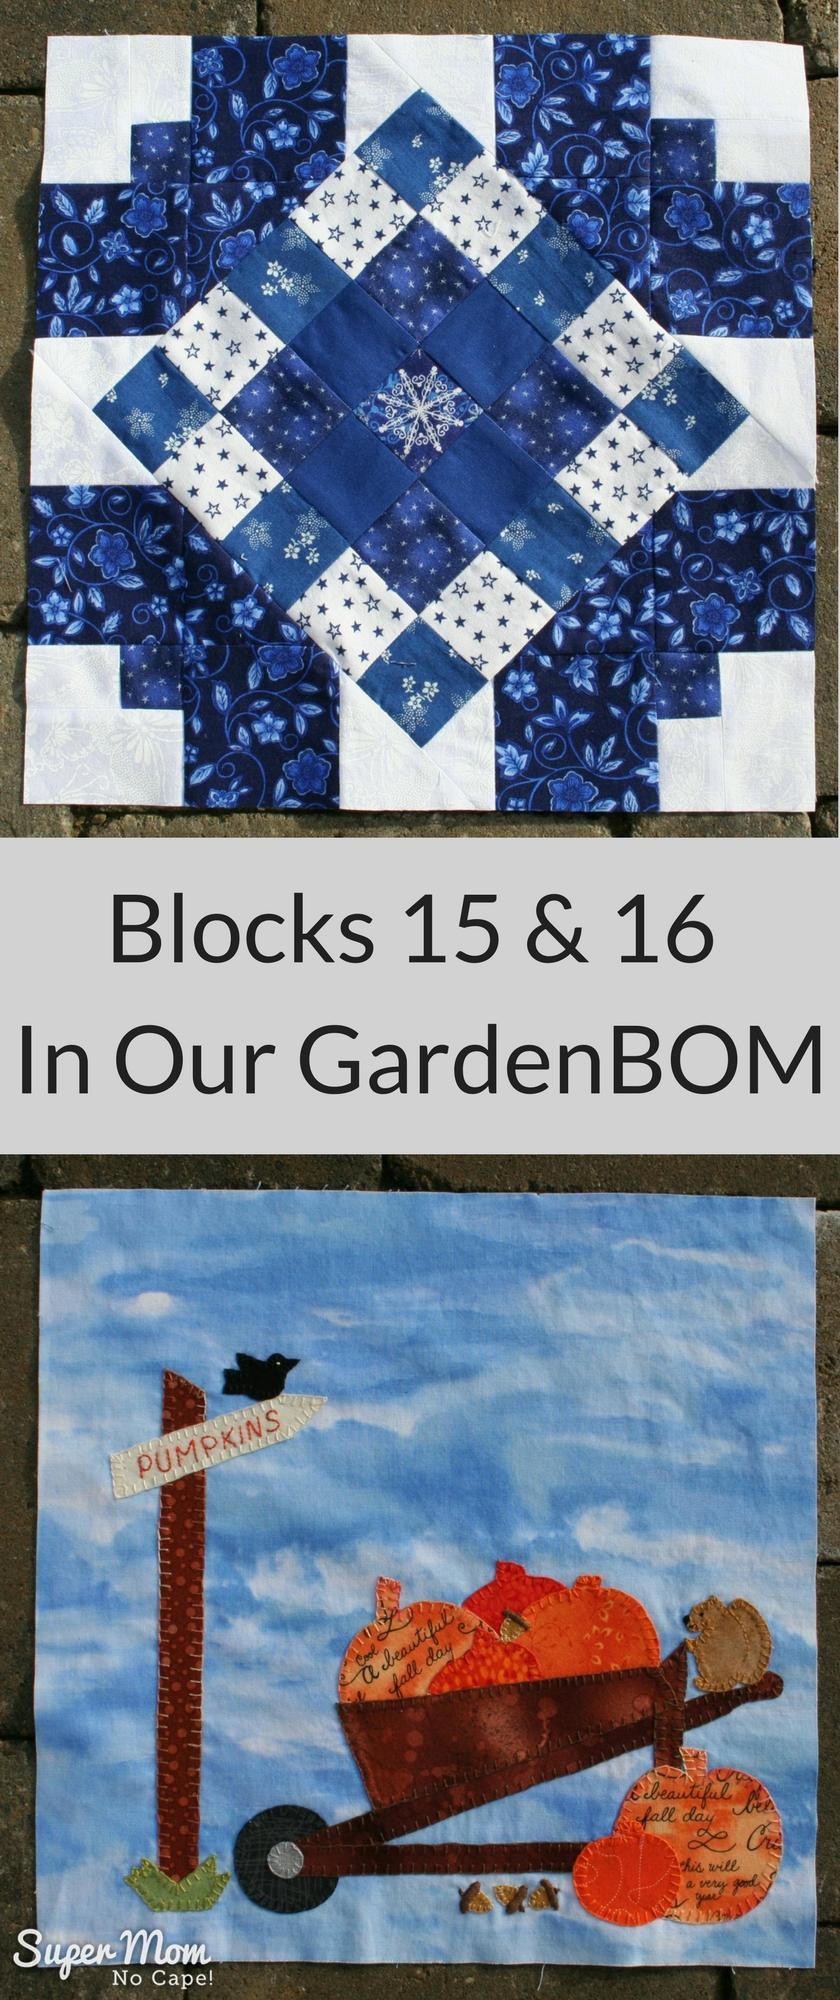 Blocks 15 & 16 - In Our Garden BOM